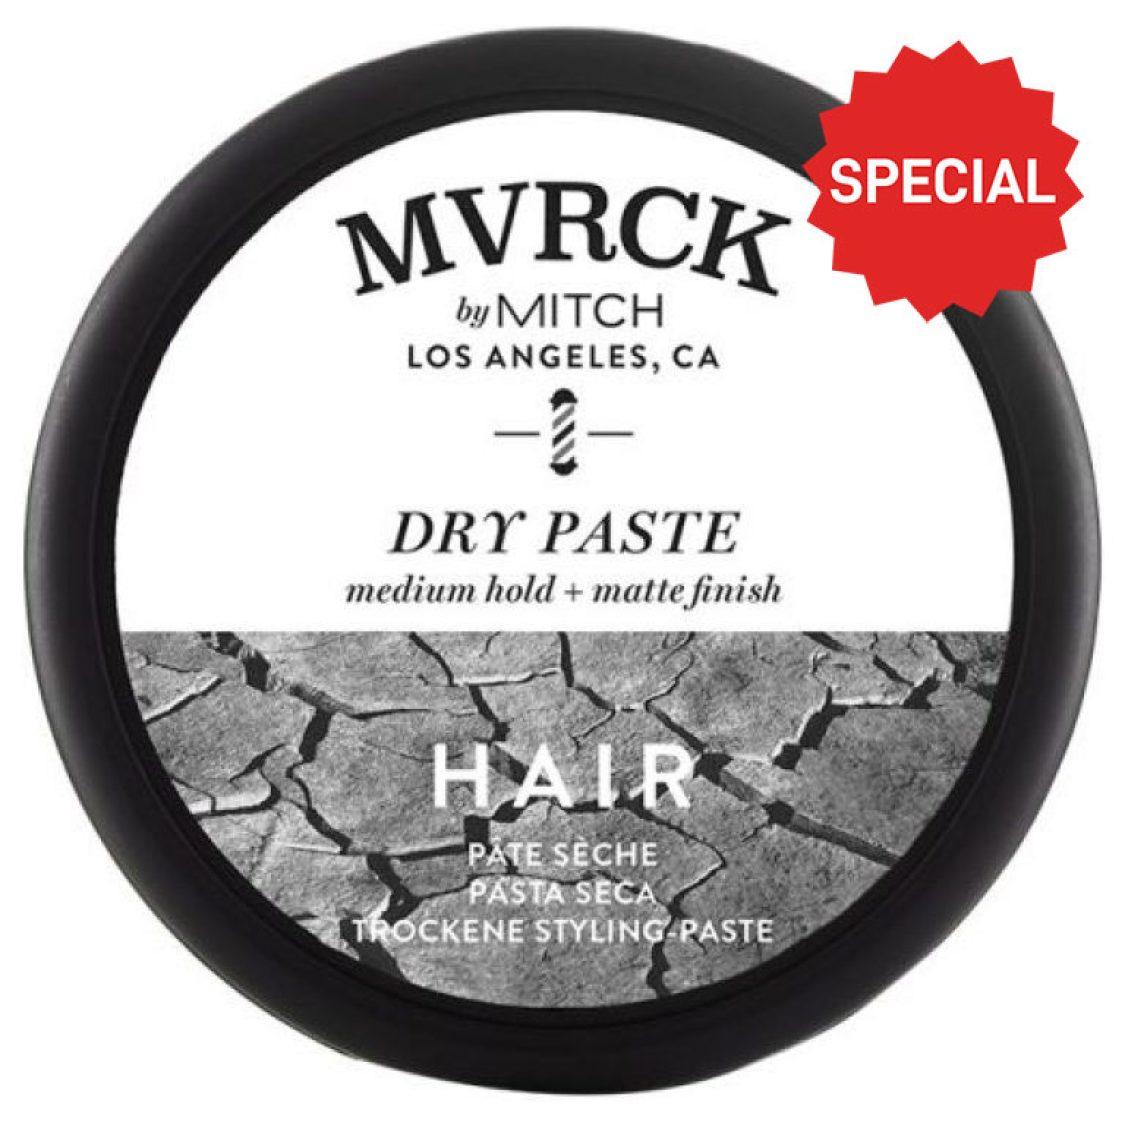 Paul Mitchell - Mvrck - Dry Paste 113g